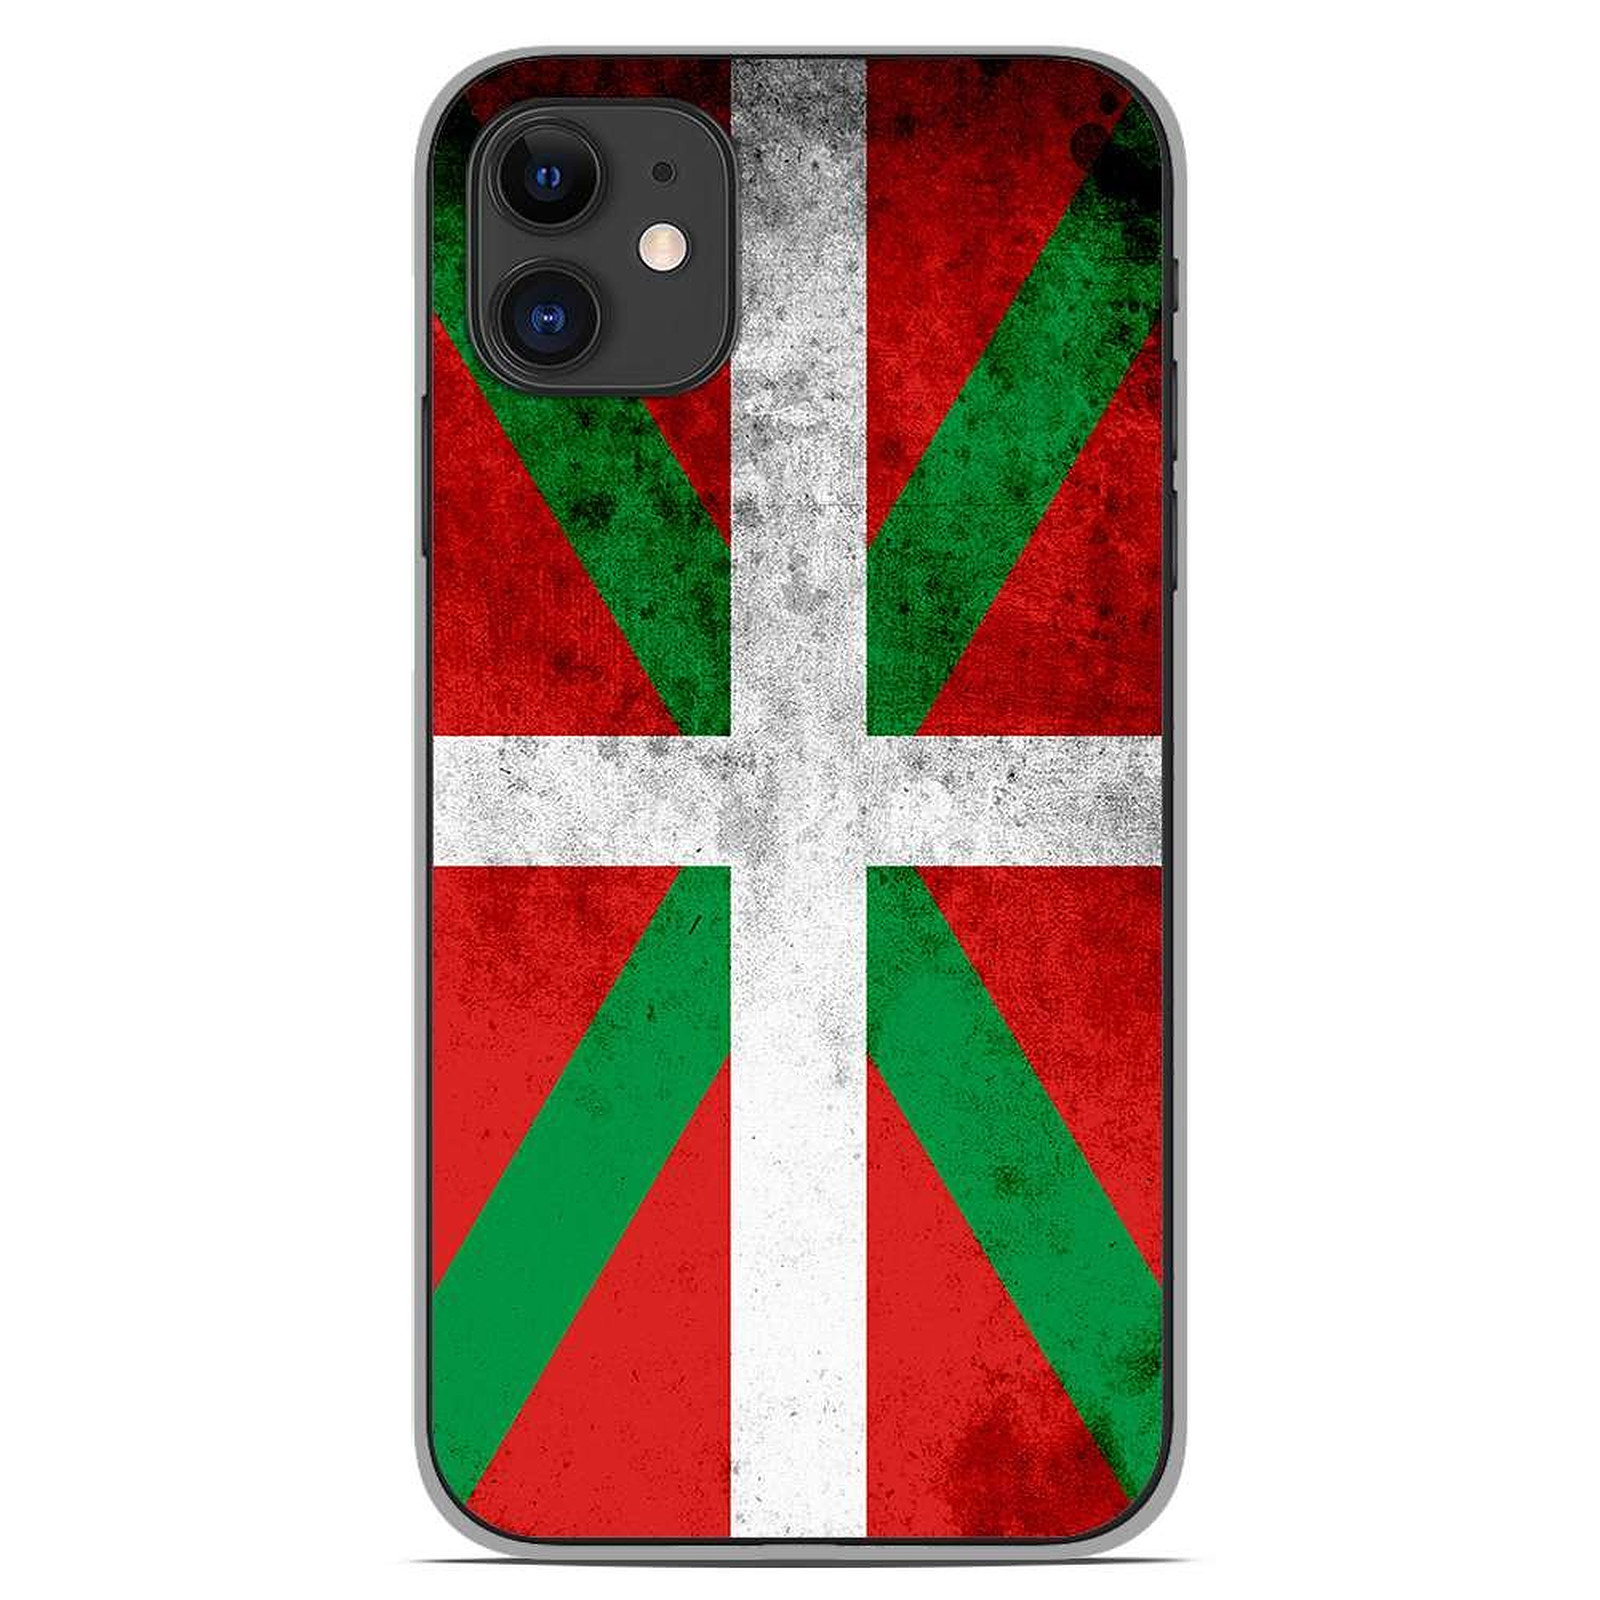 1001 Coques Coque silicone gel Apple iPhone 11 motif Drapeau Basque